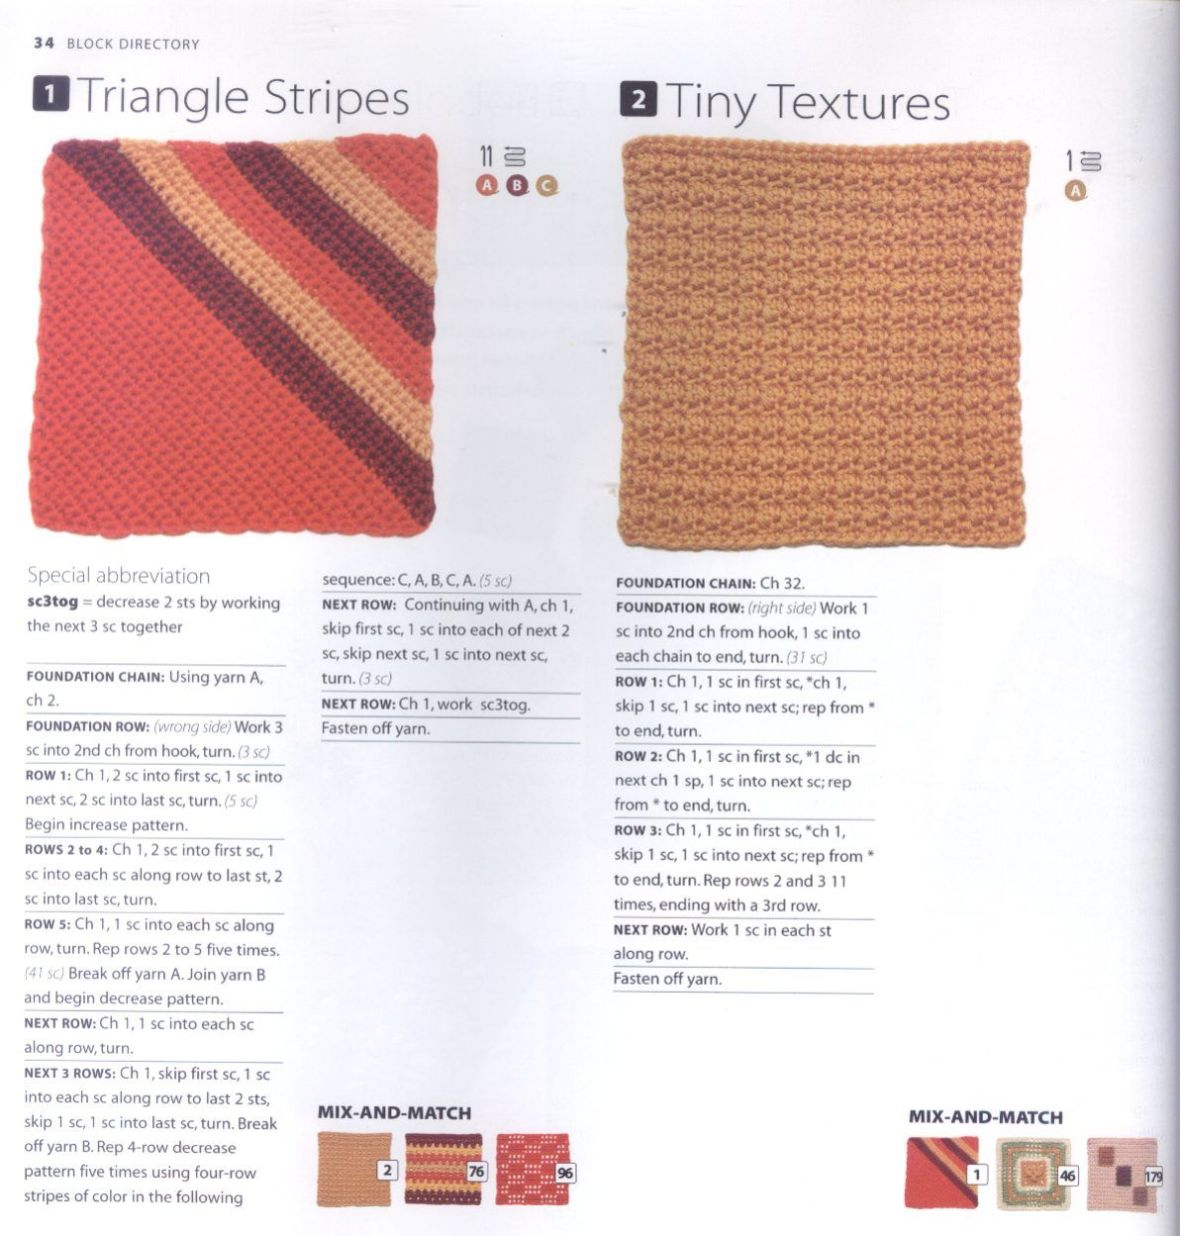 200 Crocheted Blocks for blankets, throws & Afghans 034